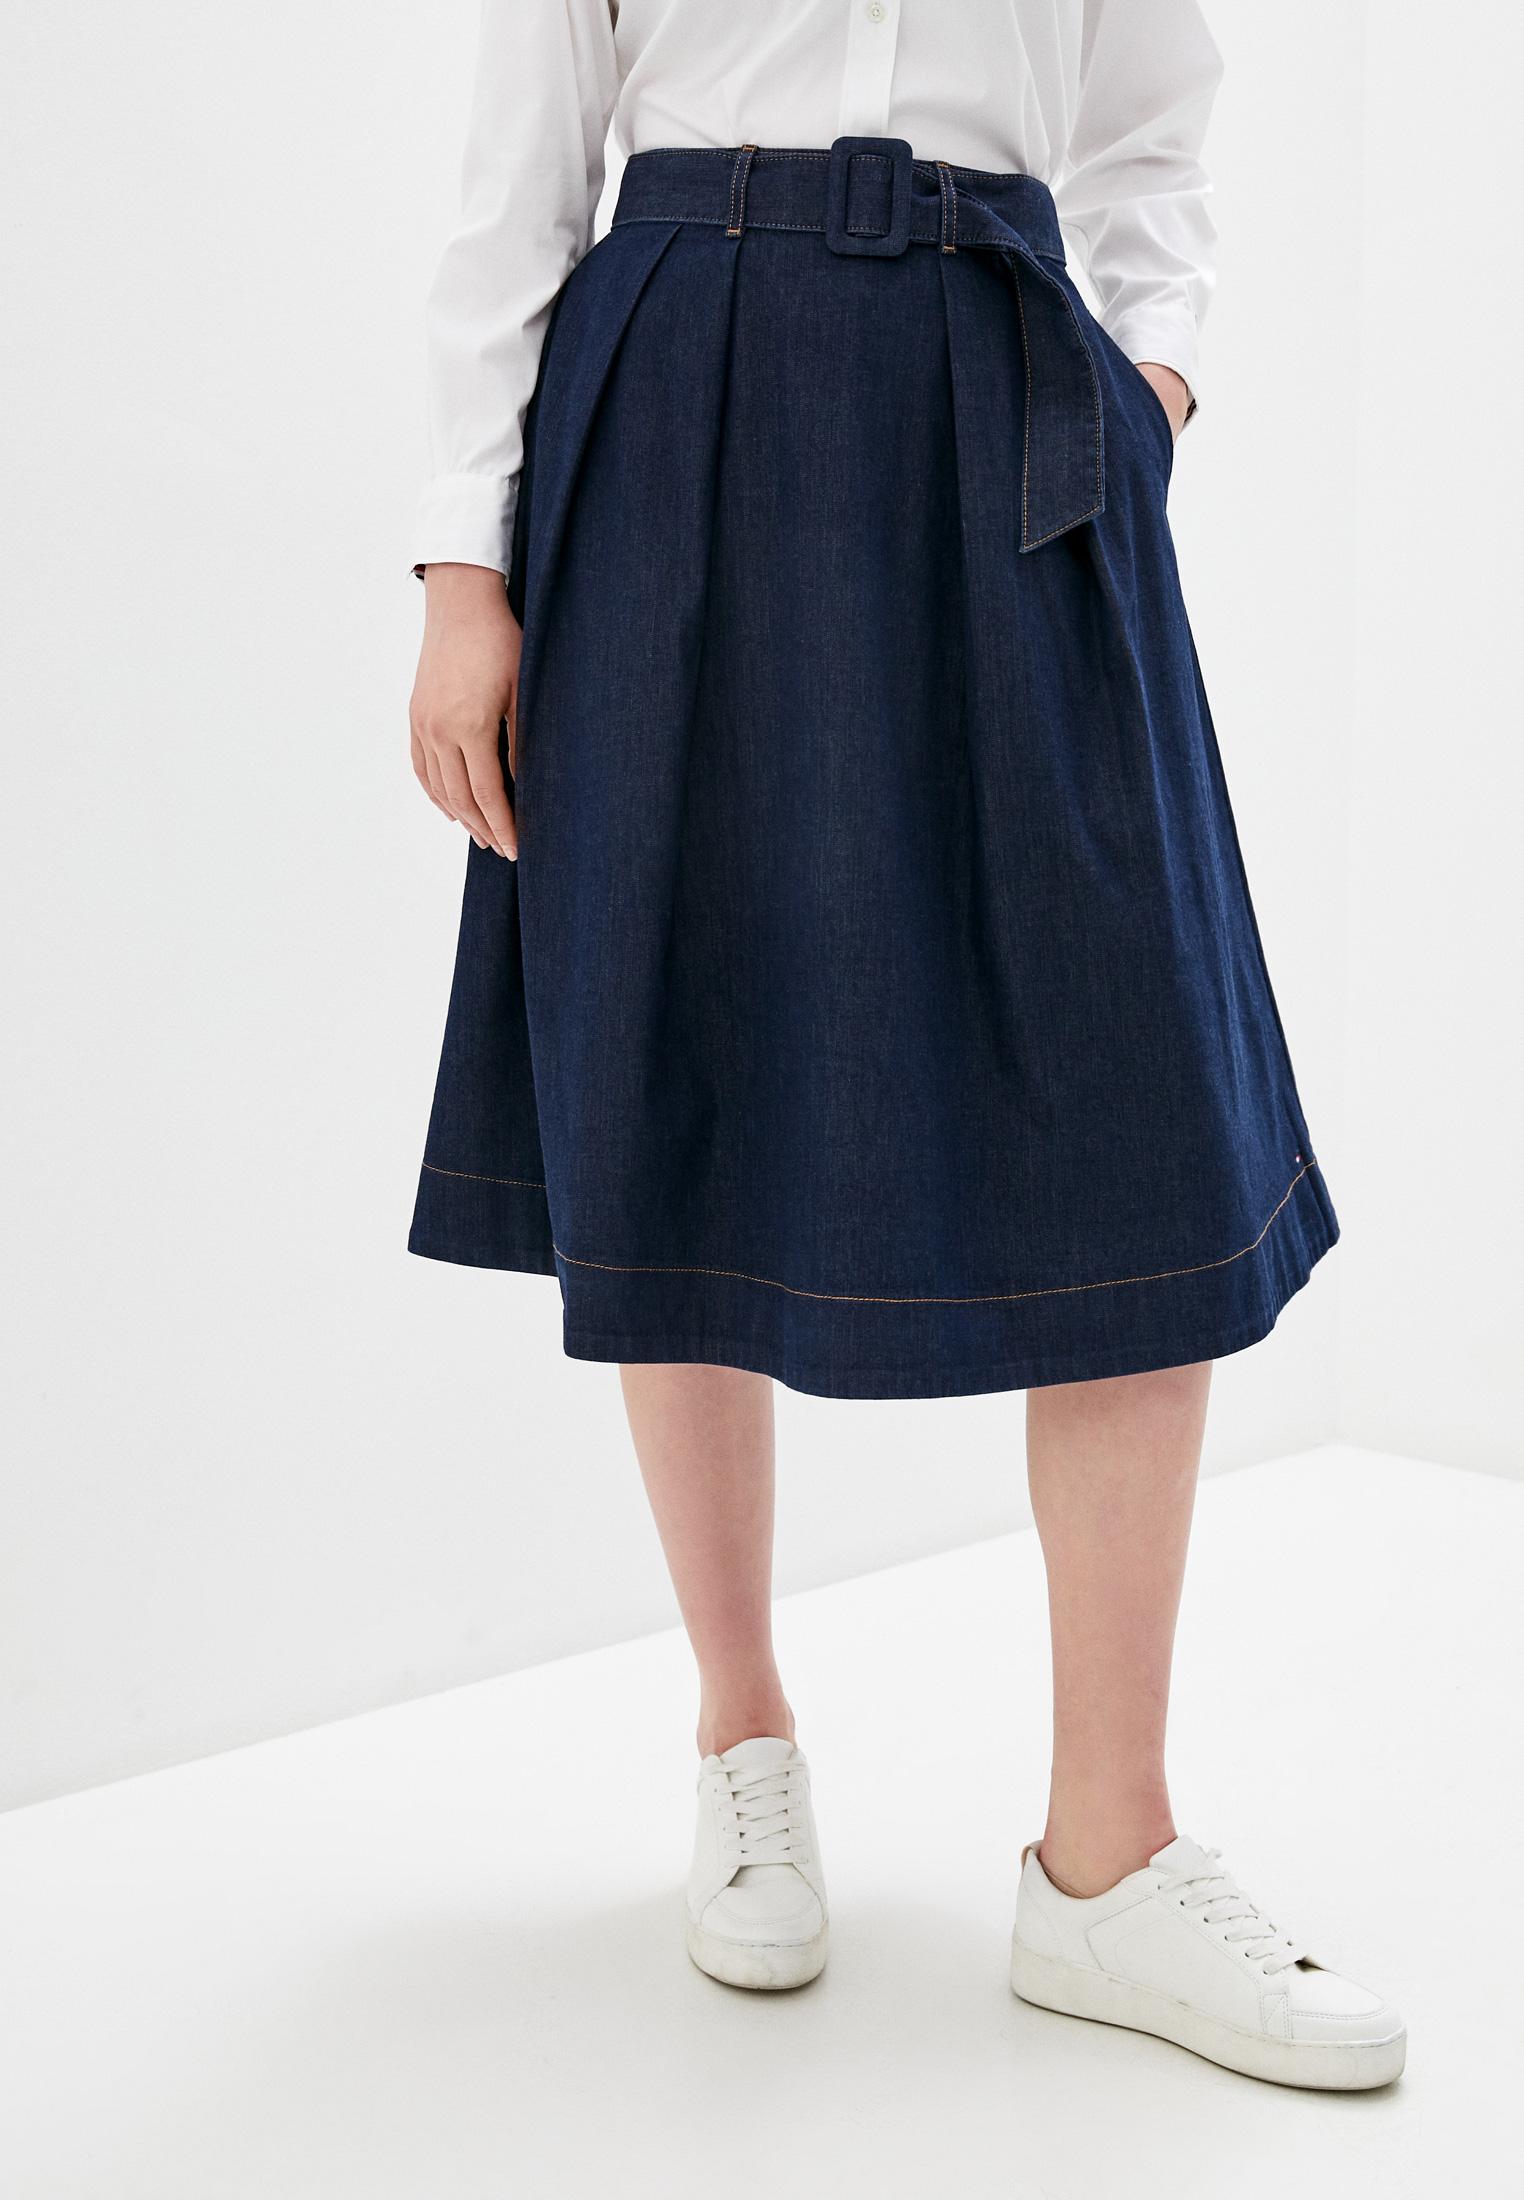 Джинсовая юбка Tommy Hilfiger (Томми Хилфигер) WW0WW27370